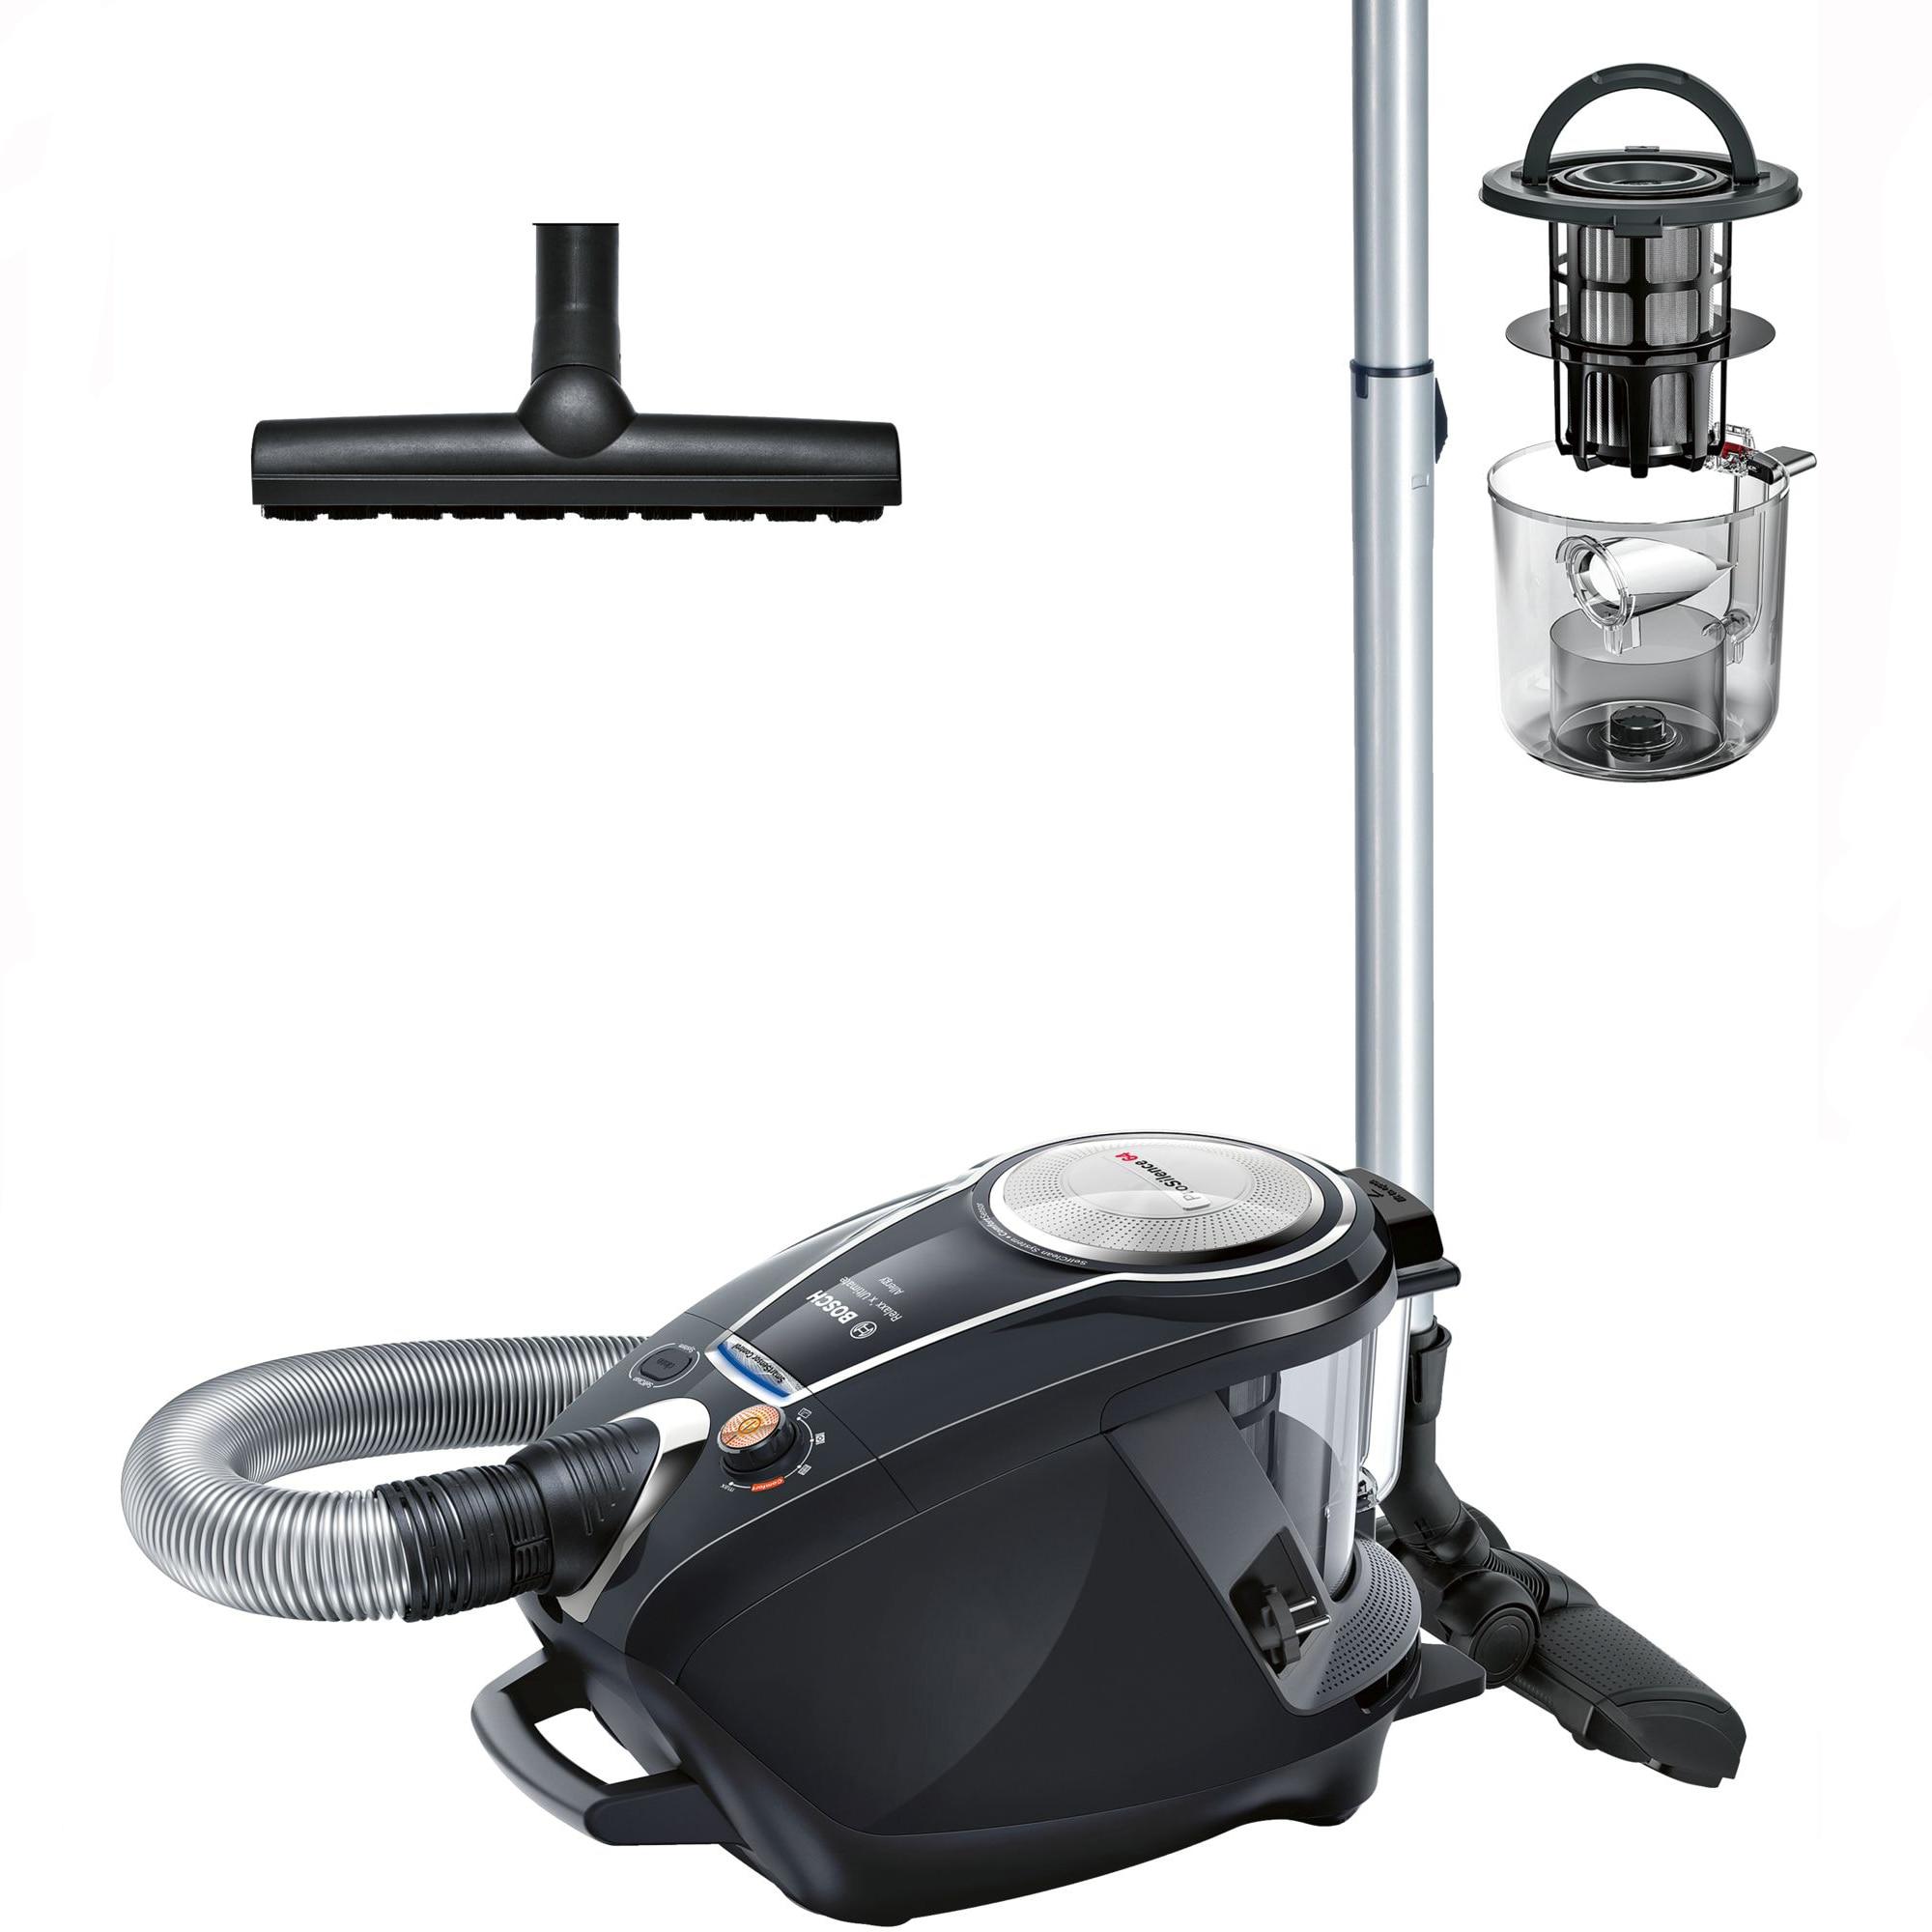 Fotografie Aspirator fara sac Bosch BGS7MS64, 3 l, 800 W, Filtru HEPA lavabil, Filtru Inteligent SelfClean System cu autocuratare, Smart Sensor Control Negru